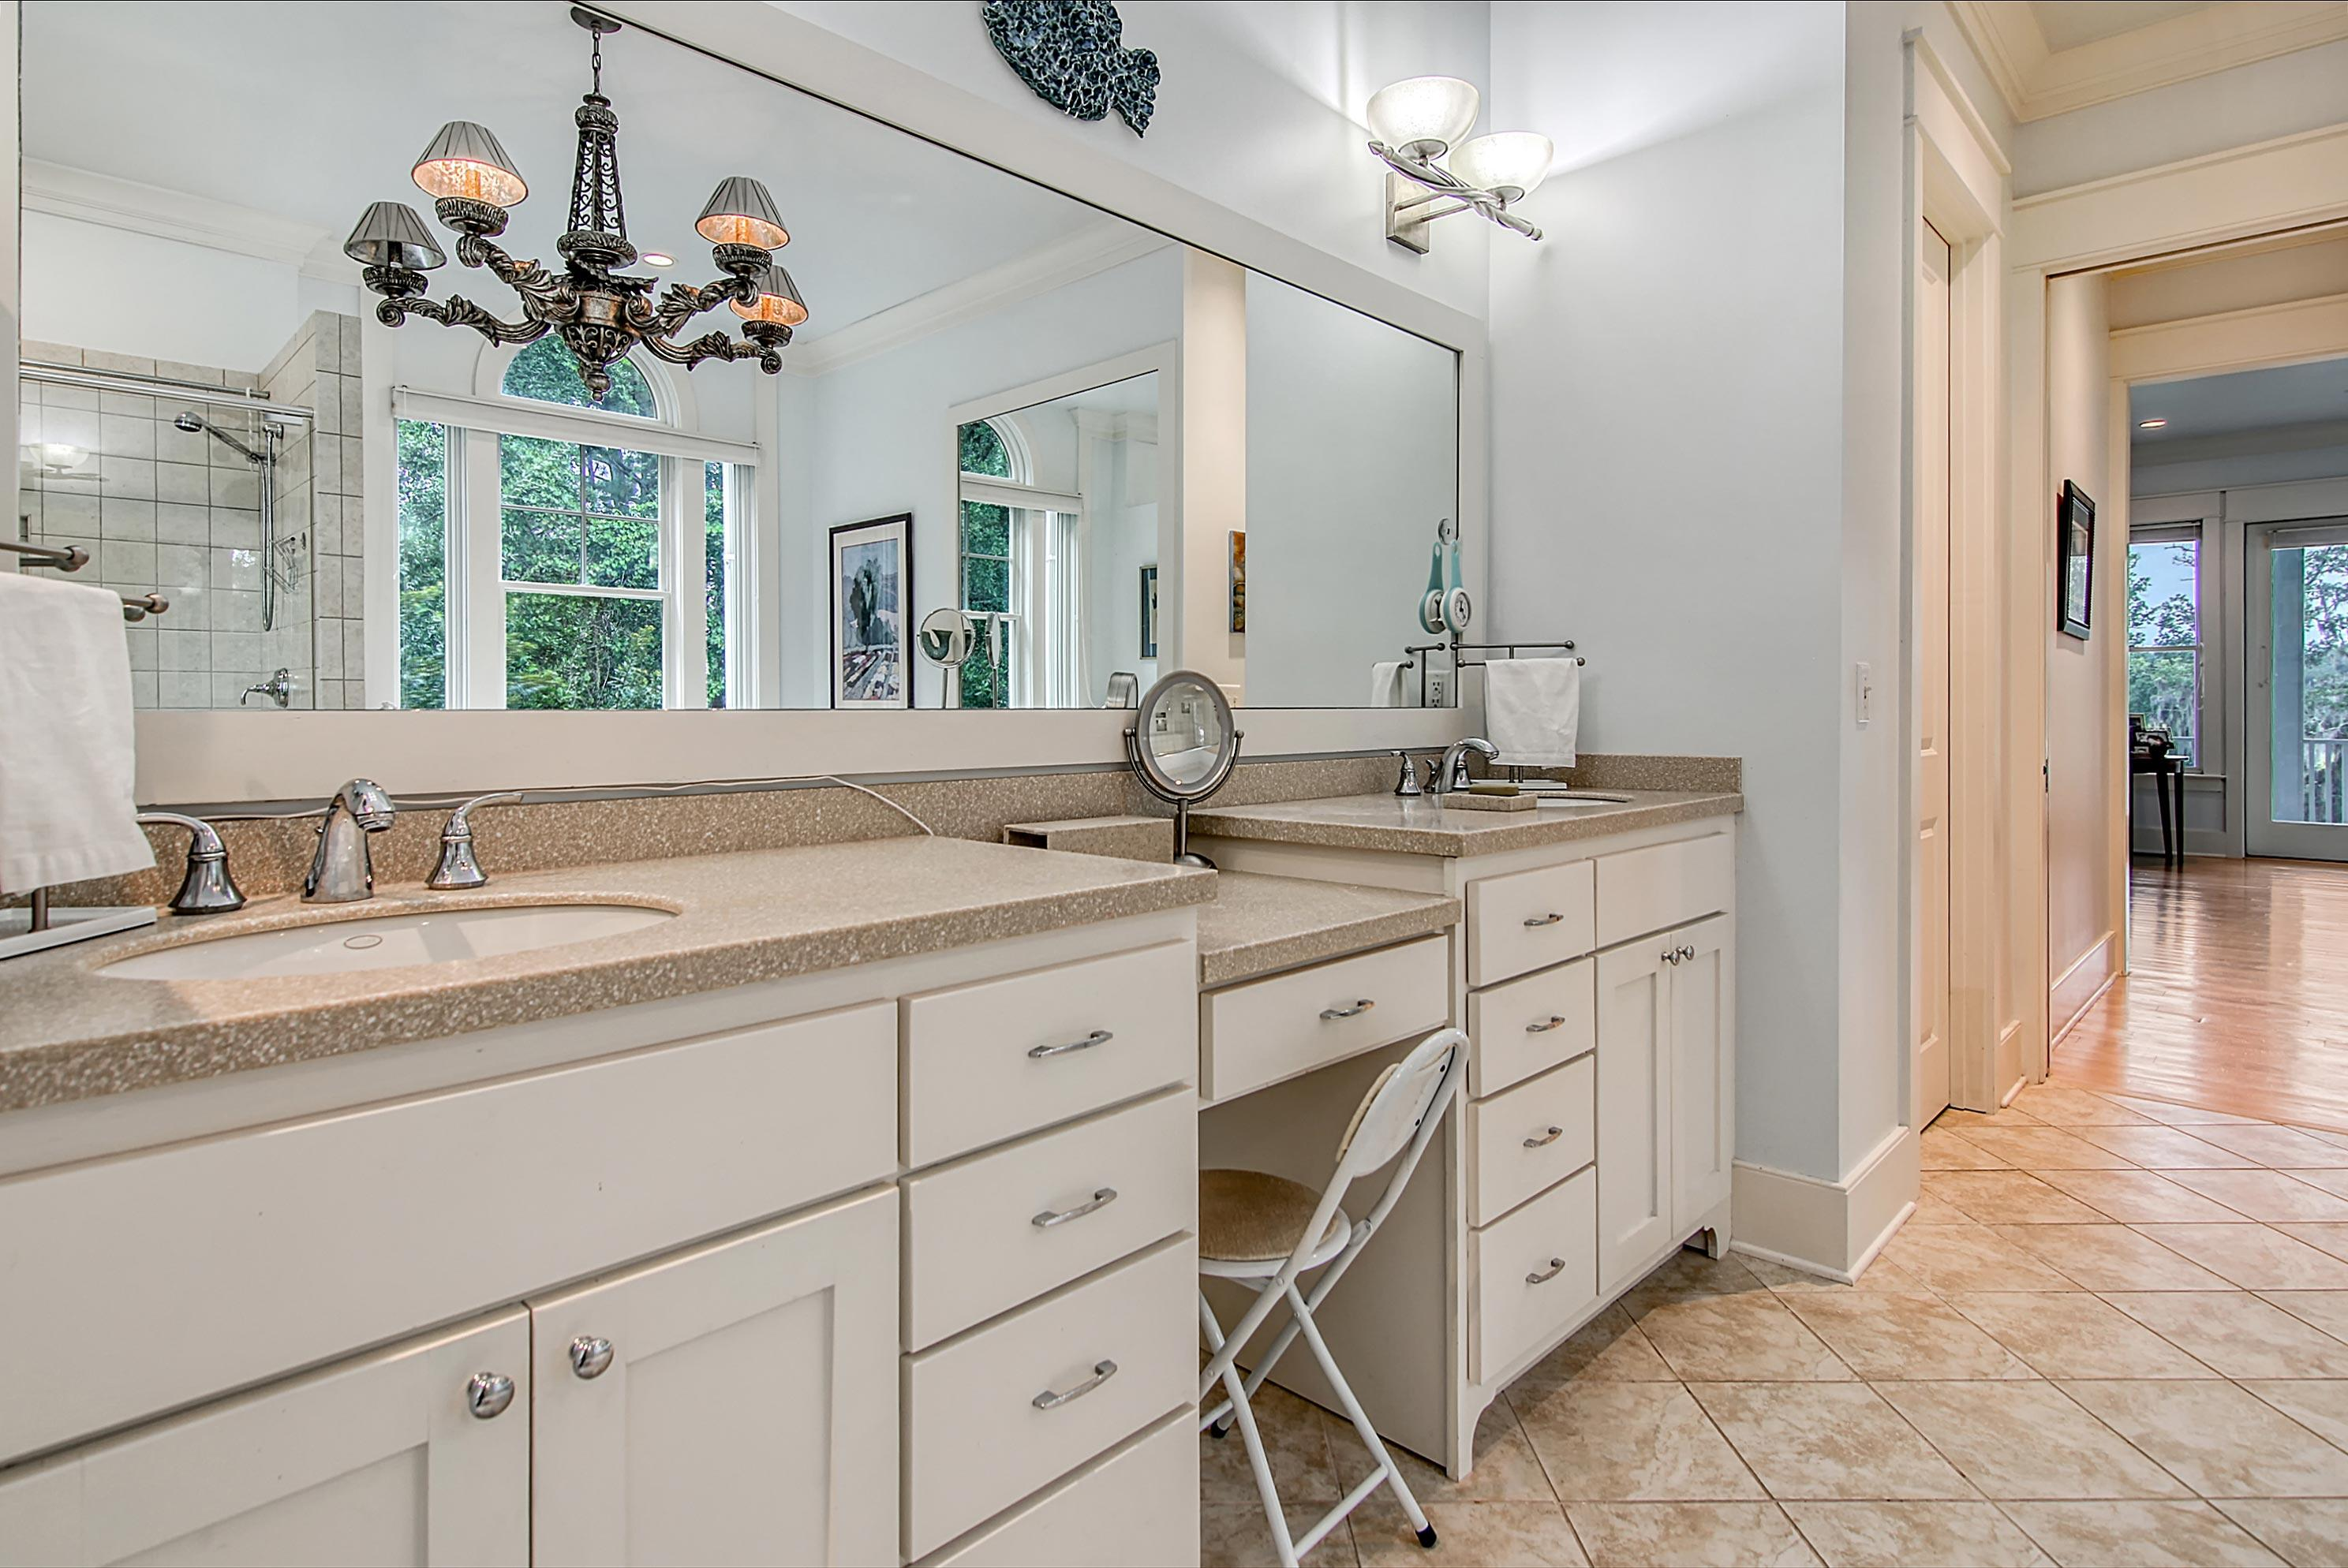 Scanlonville Homes For Sale - 152 6th, Mount Pleasant, SC - 30